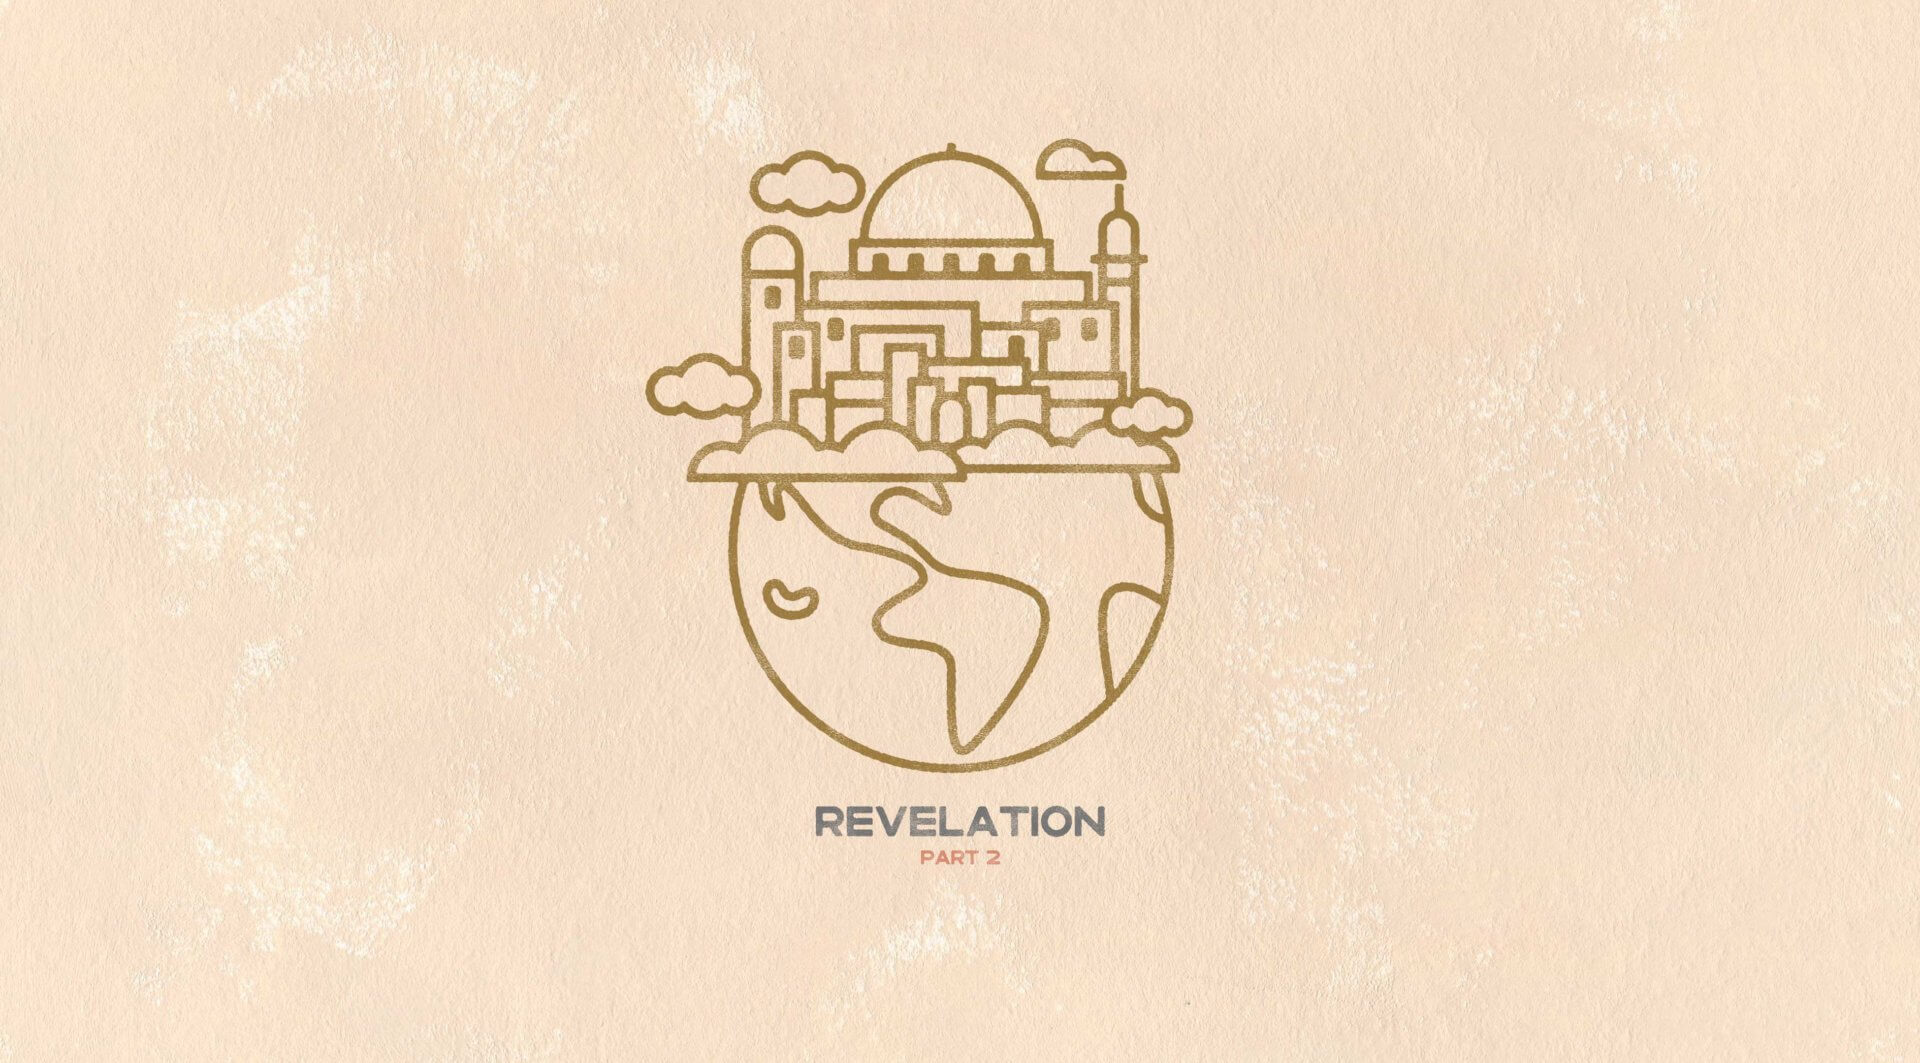 Revelation - Part 2